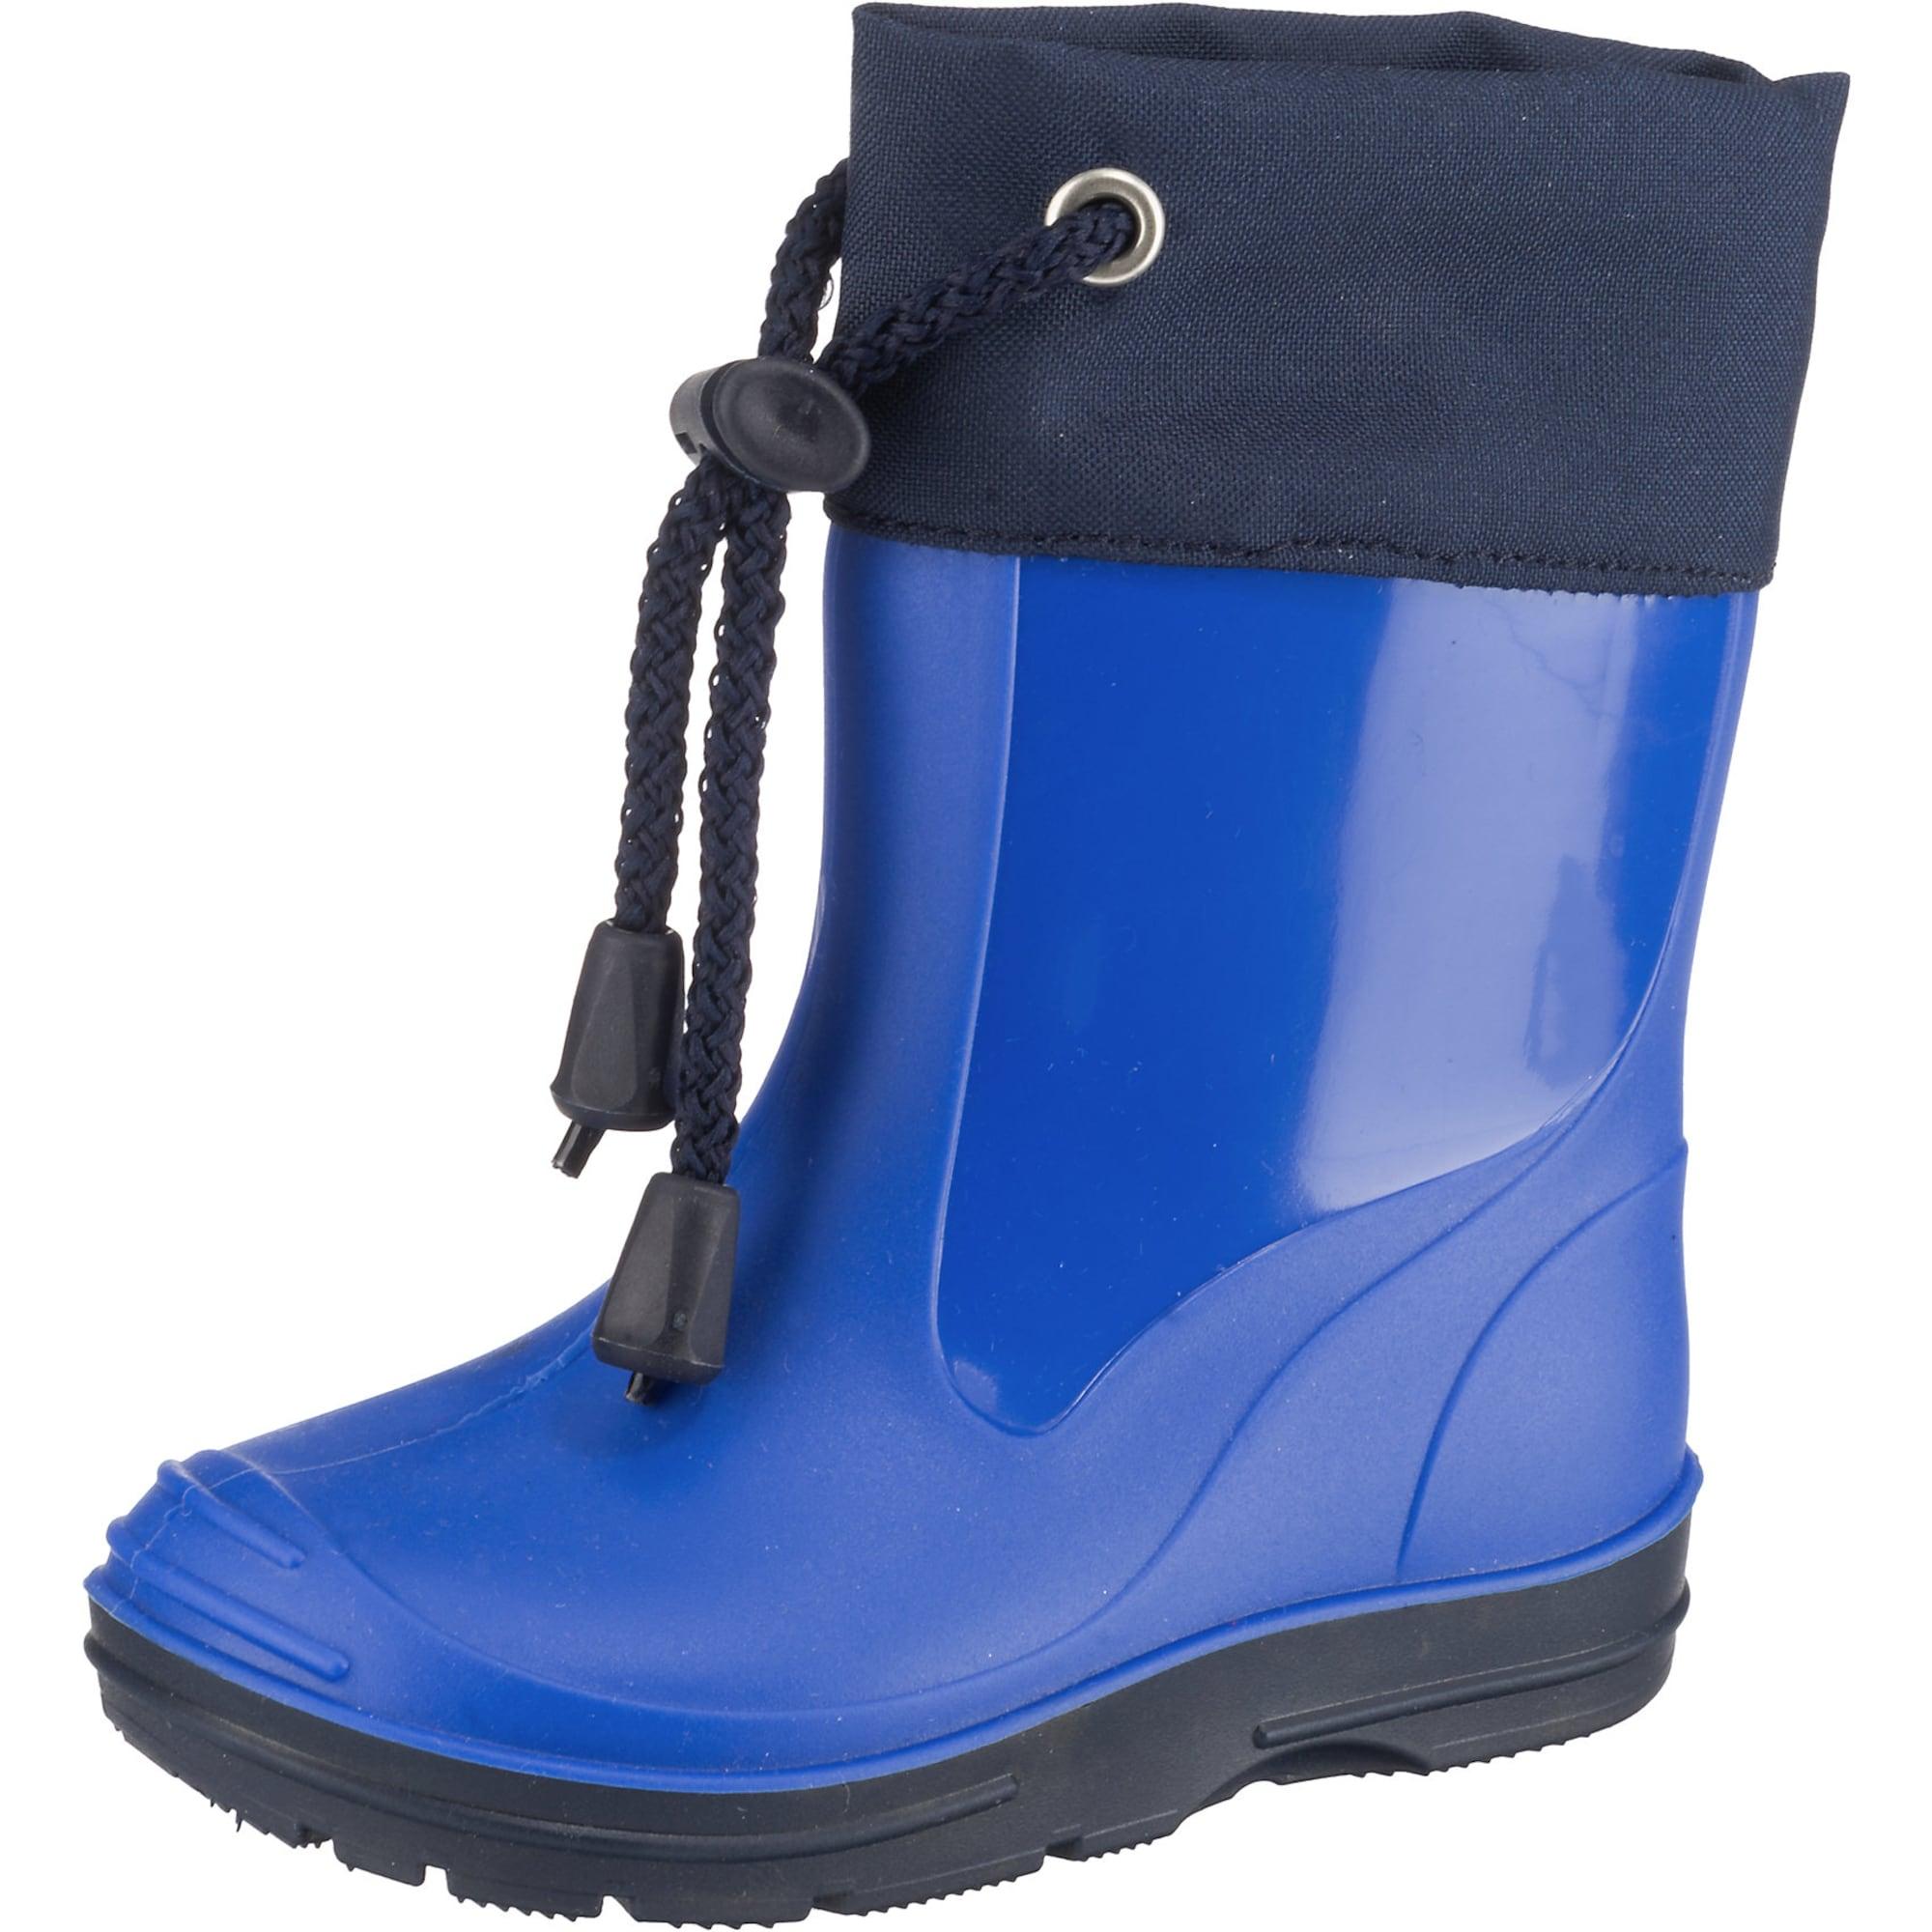 BECK Guminiai batai mėlyna / tamsiai mėlyna